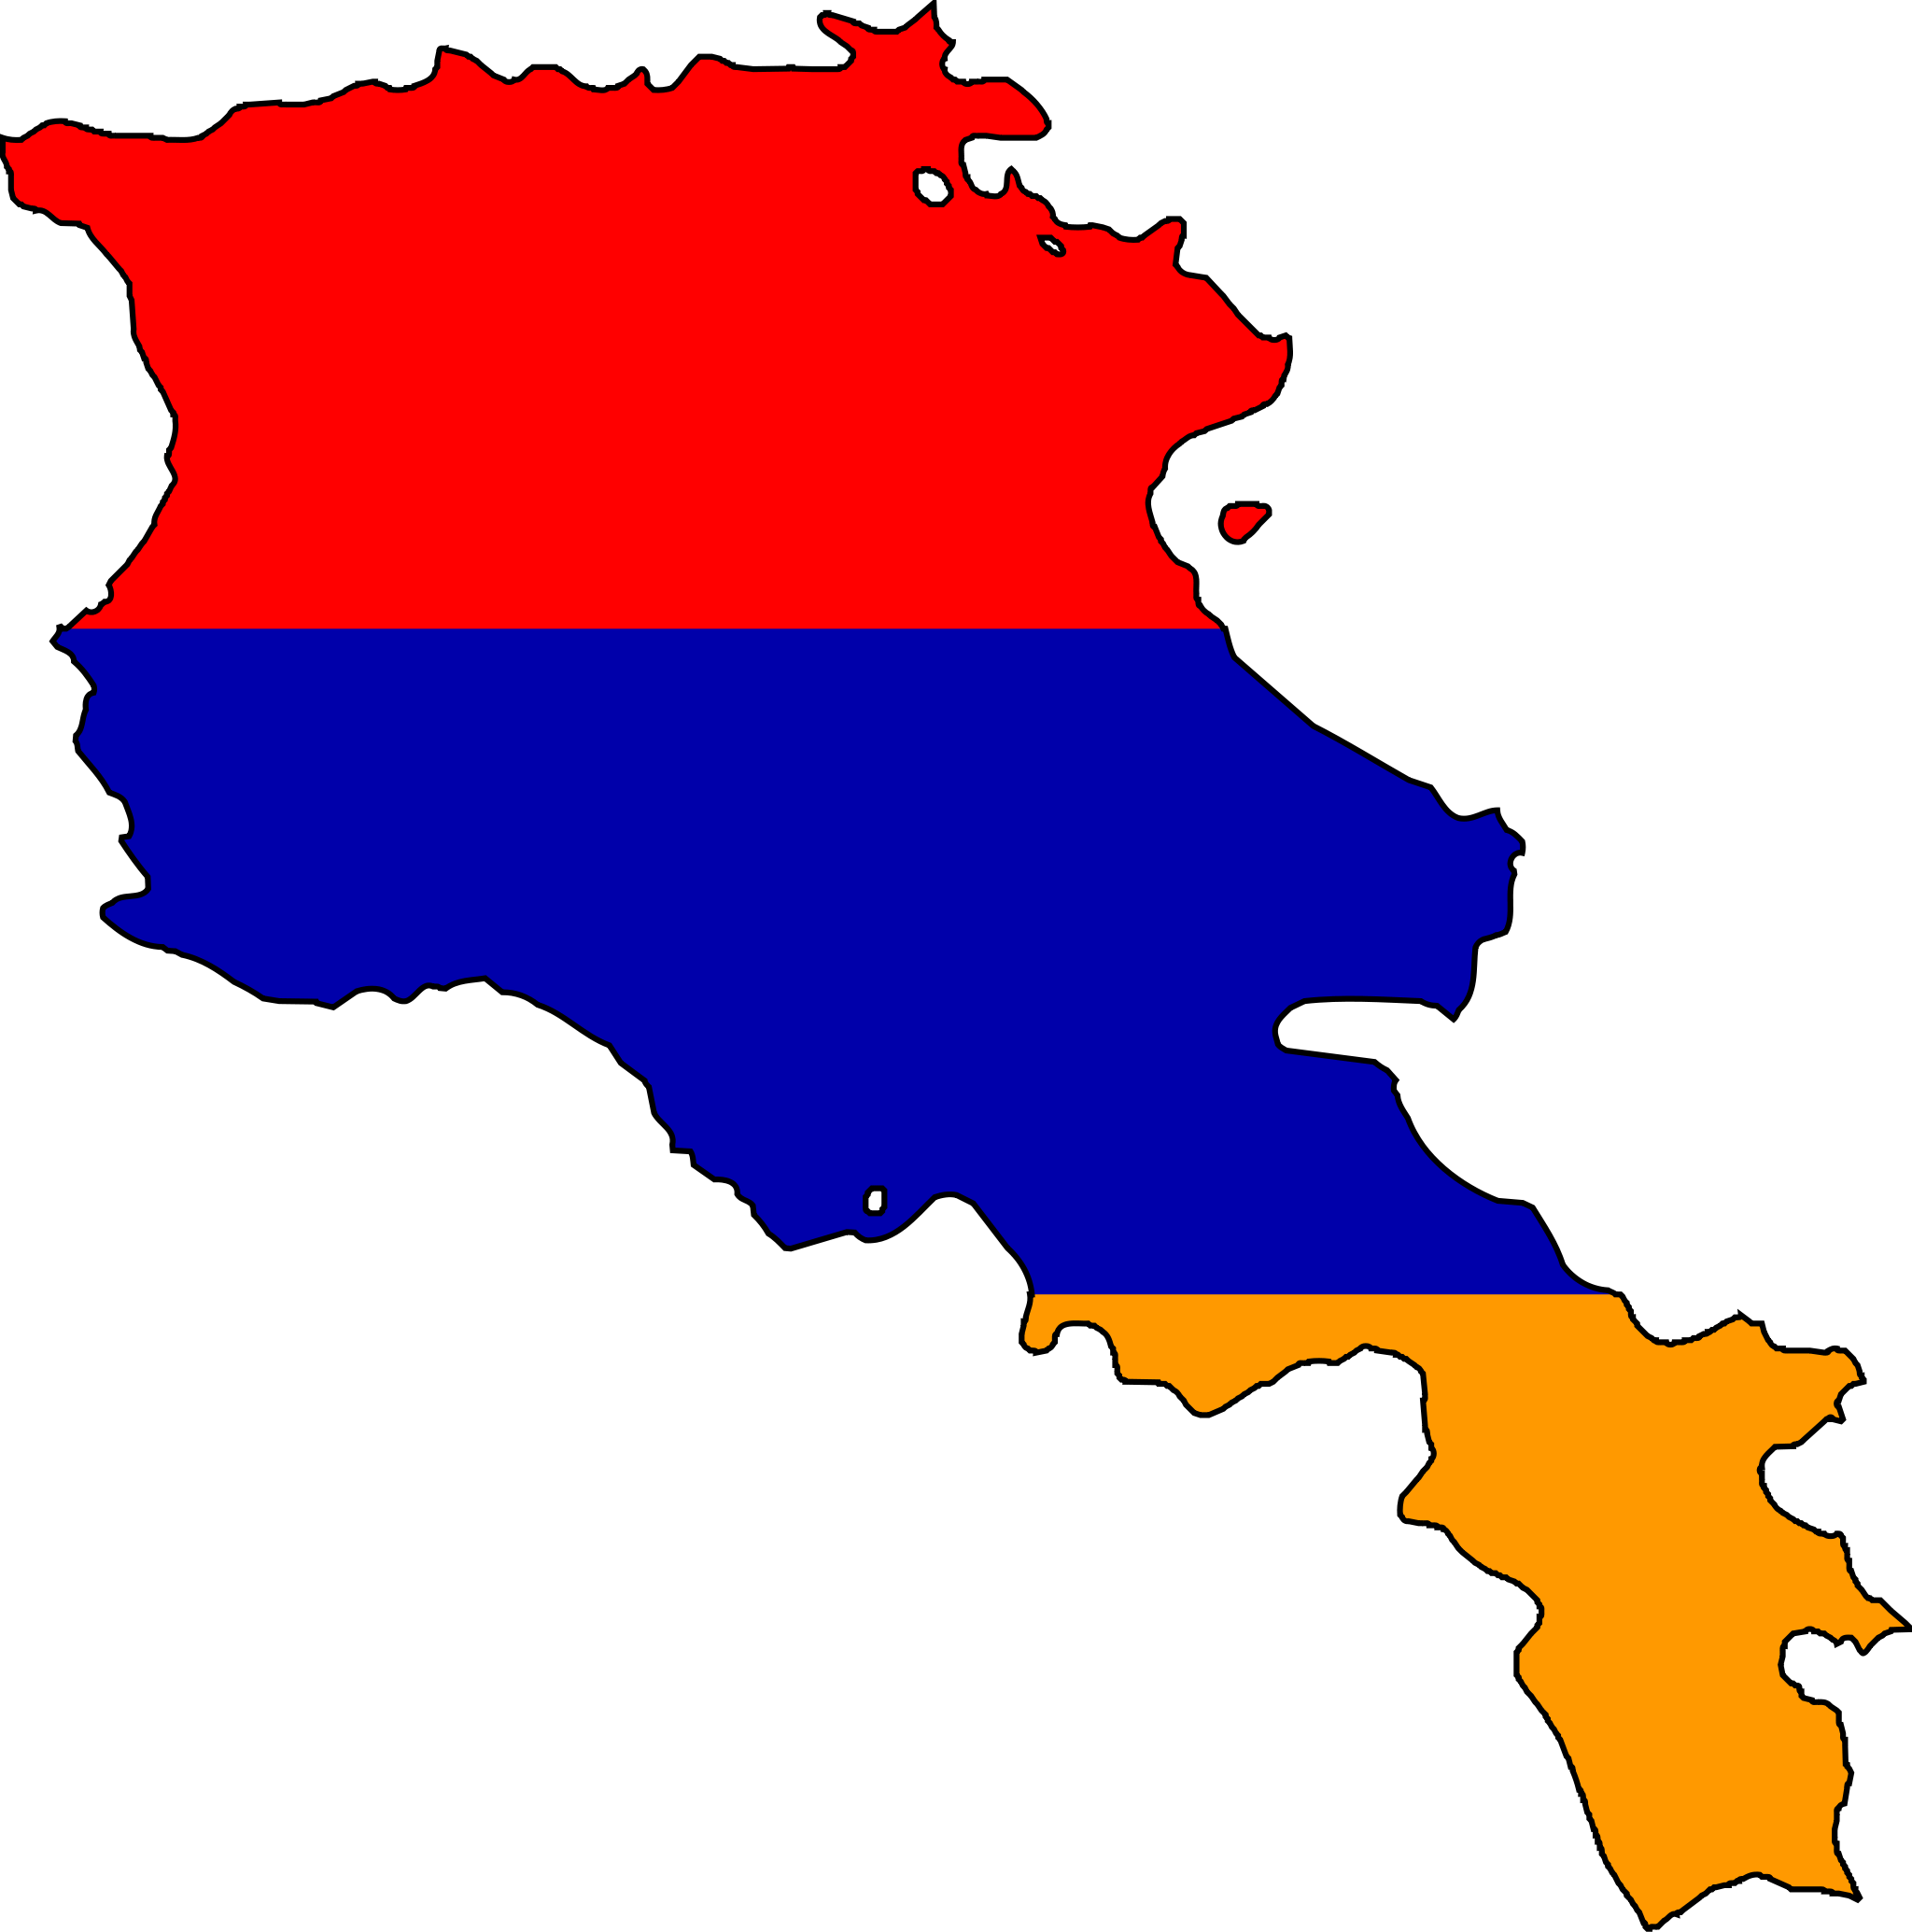 Armenia Flag Map Free Images At Clker Com Vector Clip